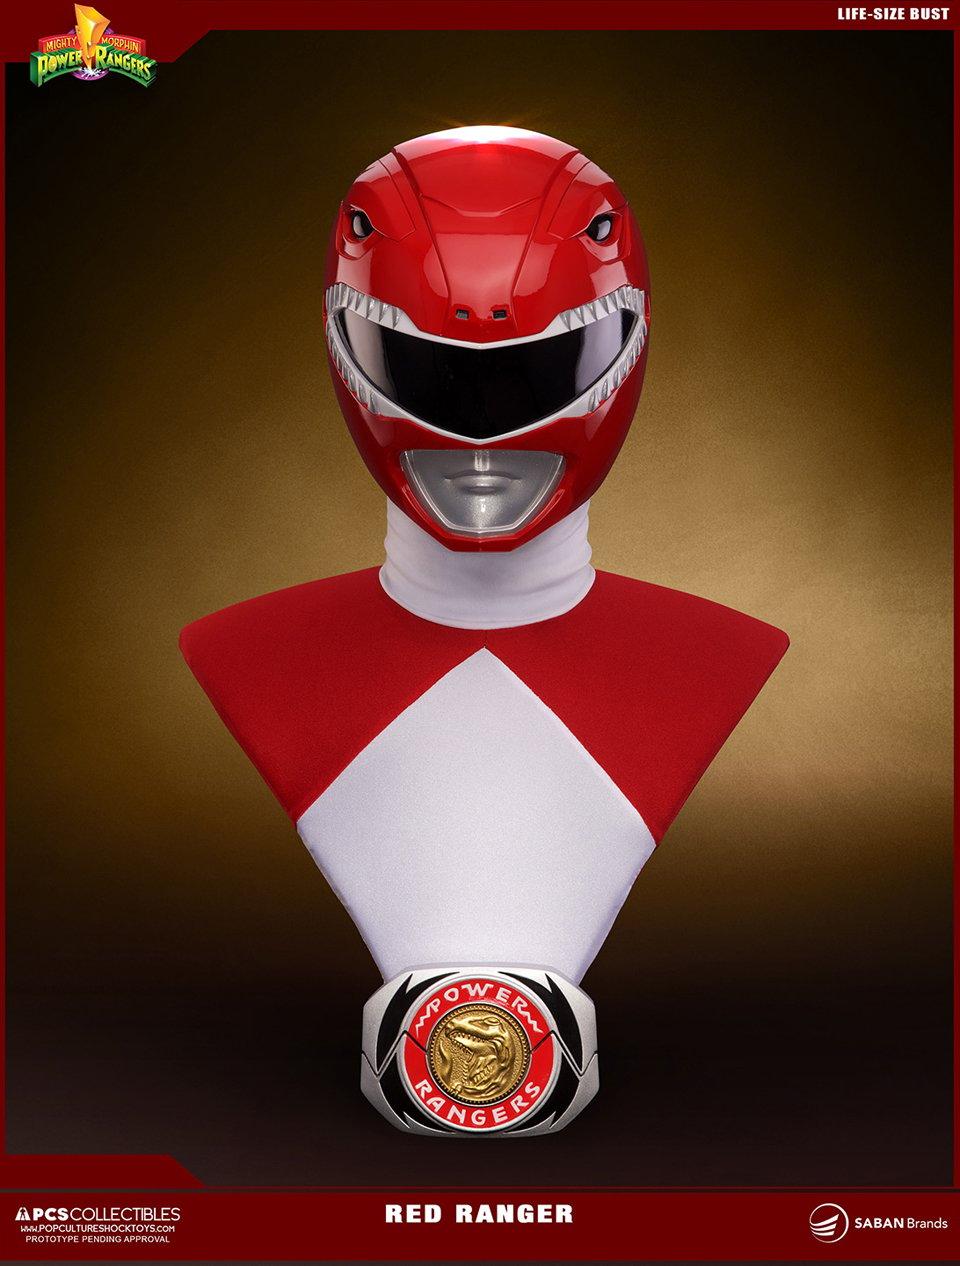 PCS MMPR Red Ranger Life-size Bust